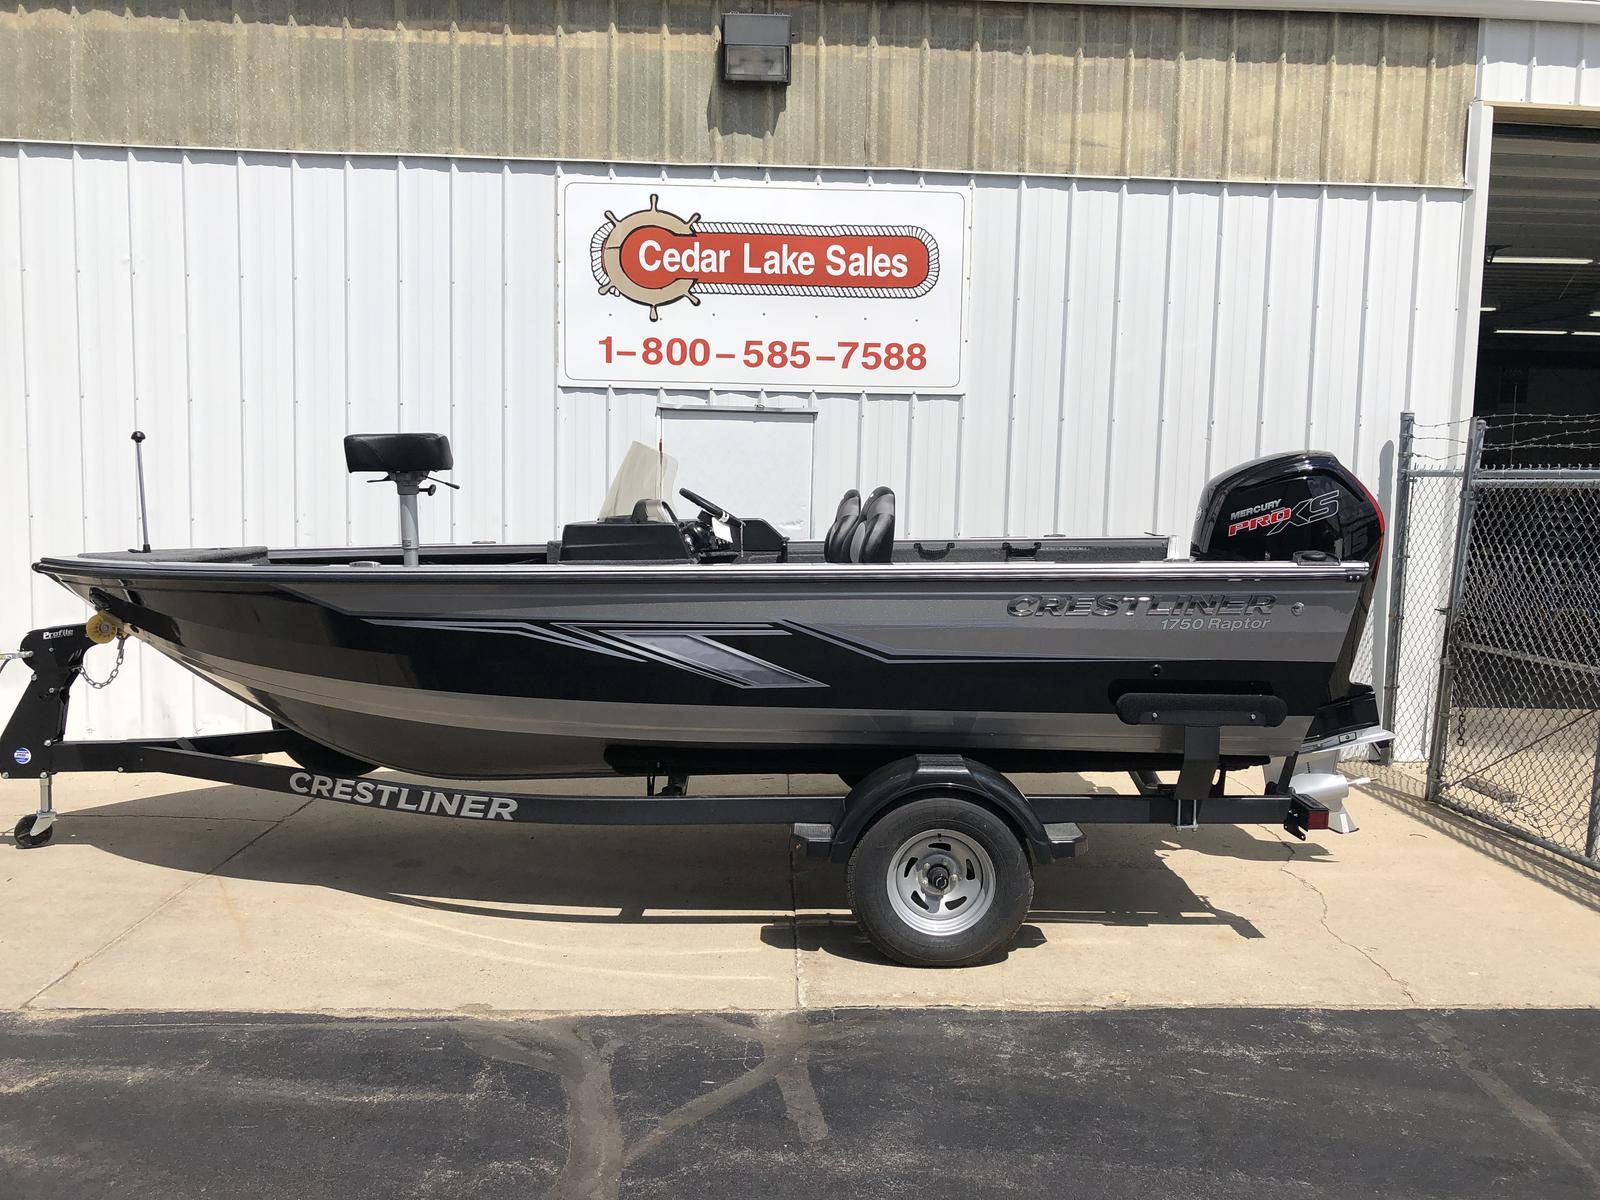 Inventory from Crestliner Cedar Lake Sales West Bend, WI